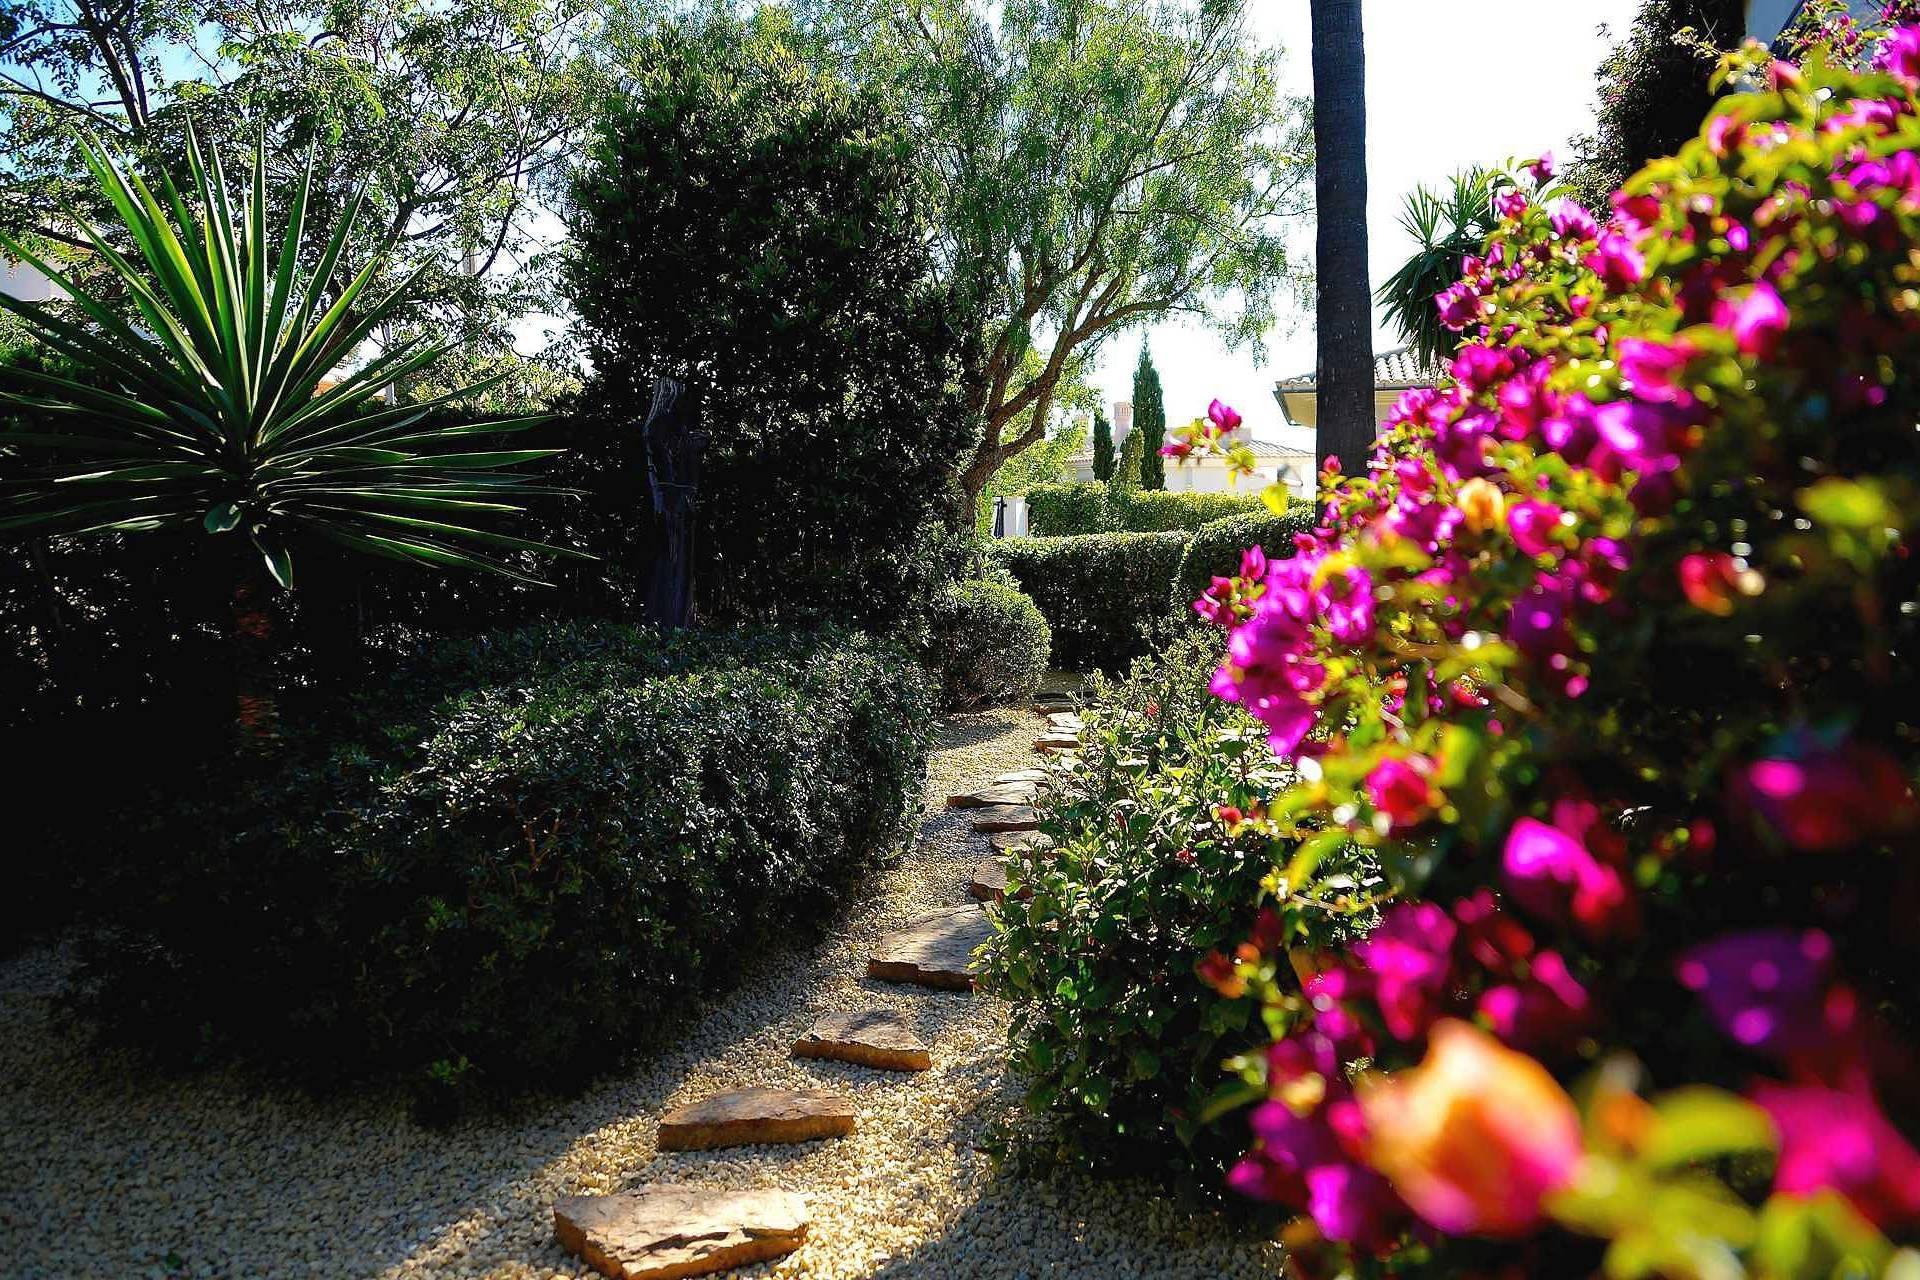 01-95 Ferienhaus Mallorca Süden mit Meerblick Bild 33